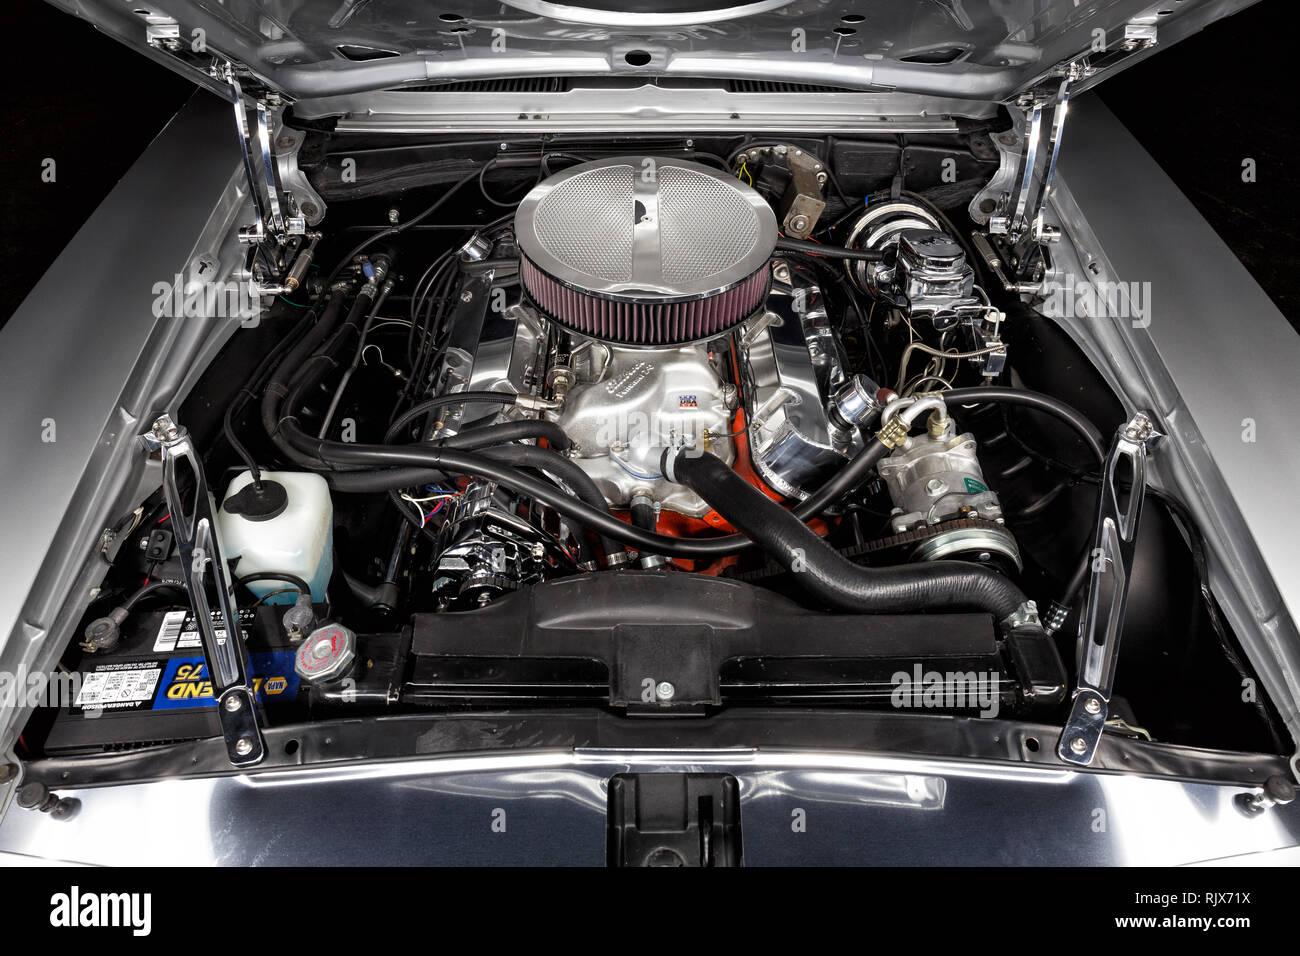 Kelebihan Chevrolet Camaro Ss 1969 Spesifikasi